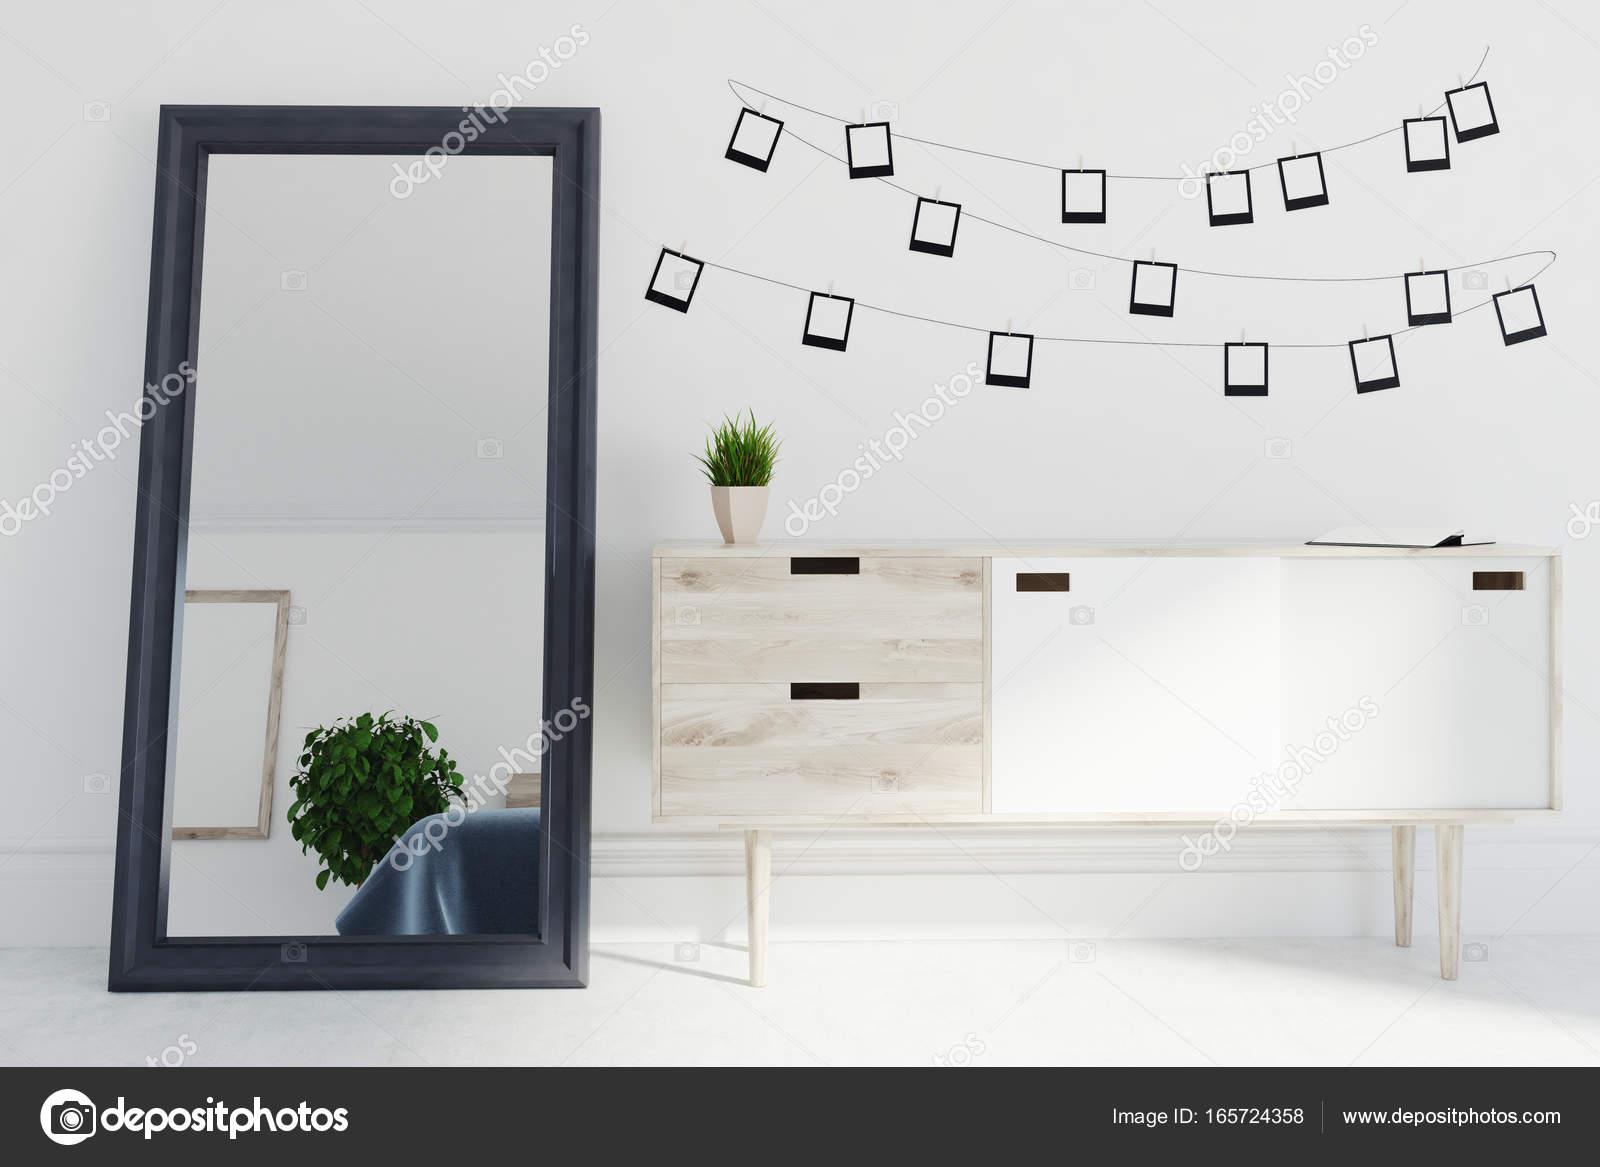 https://st3.depositphotos.com/2673929/16572/i/1600/depositphotos_165724358-stockafbeelding-woonkamer-interieur-spiegel-fotos-kast.jpg